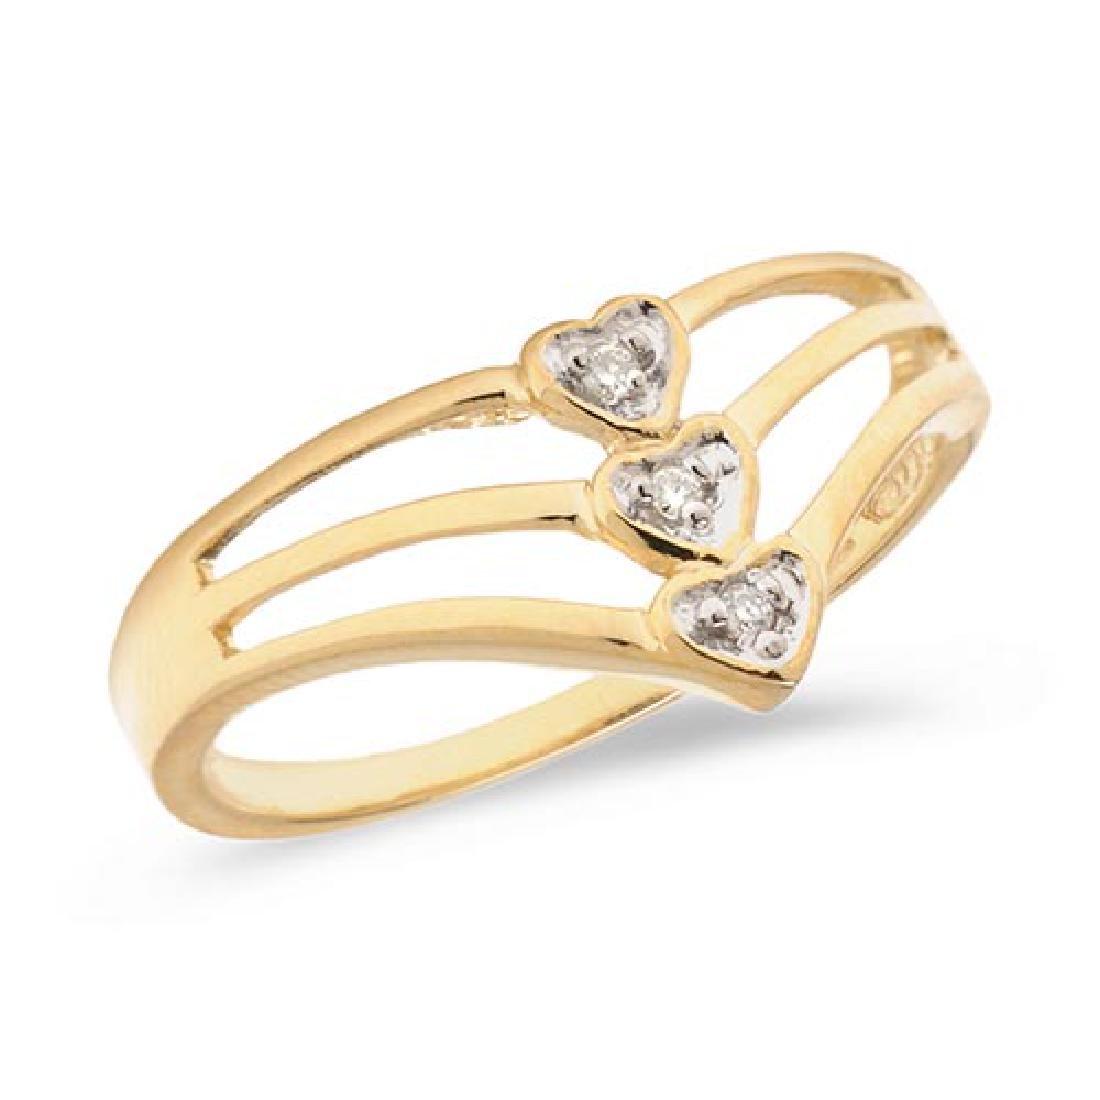 Certified 14K Yellow Gold Diamond Heart Ring 0.02 CTW